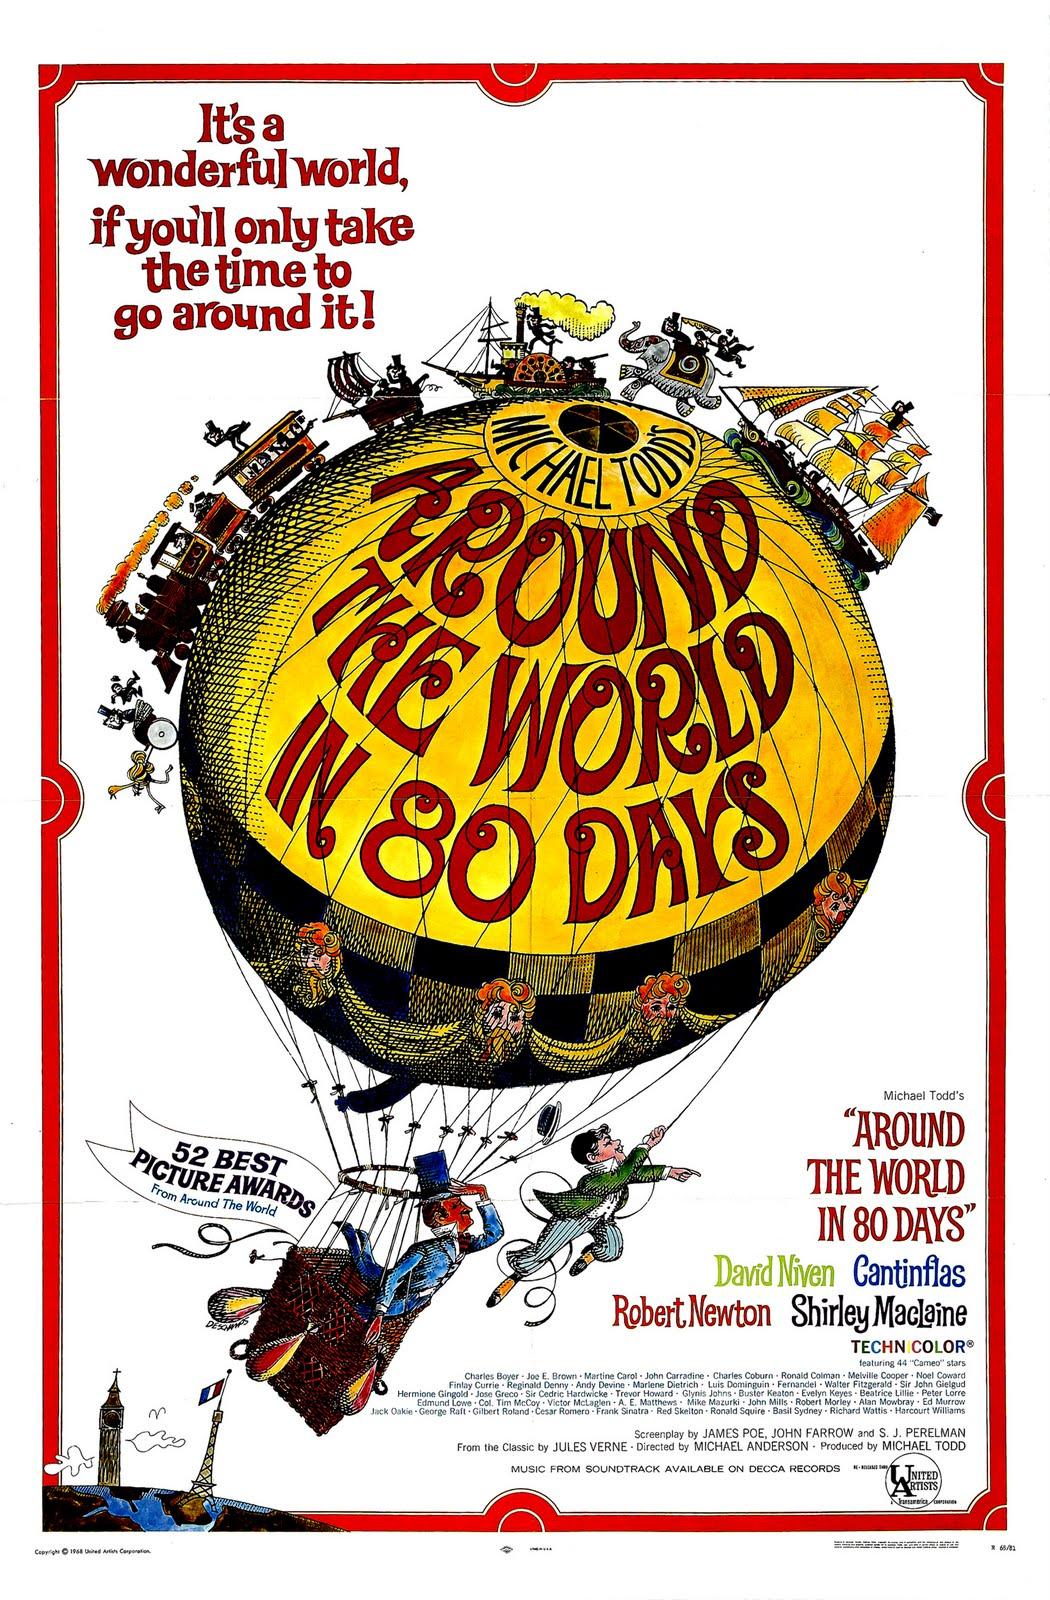 MOVIE POSTERS: AROUND THE WORLD IN 80 DAYS (1956